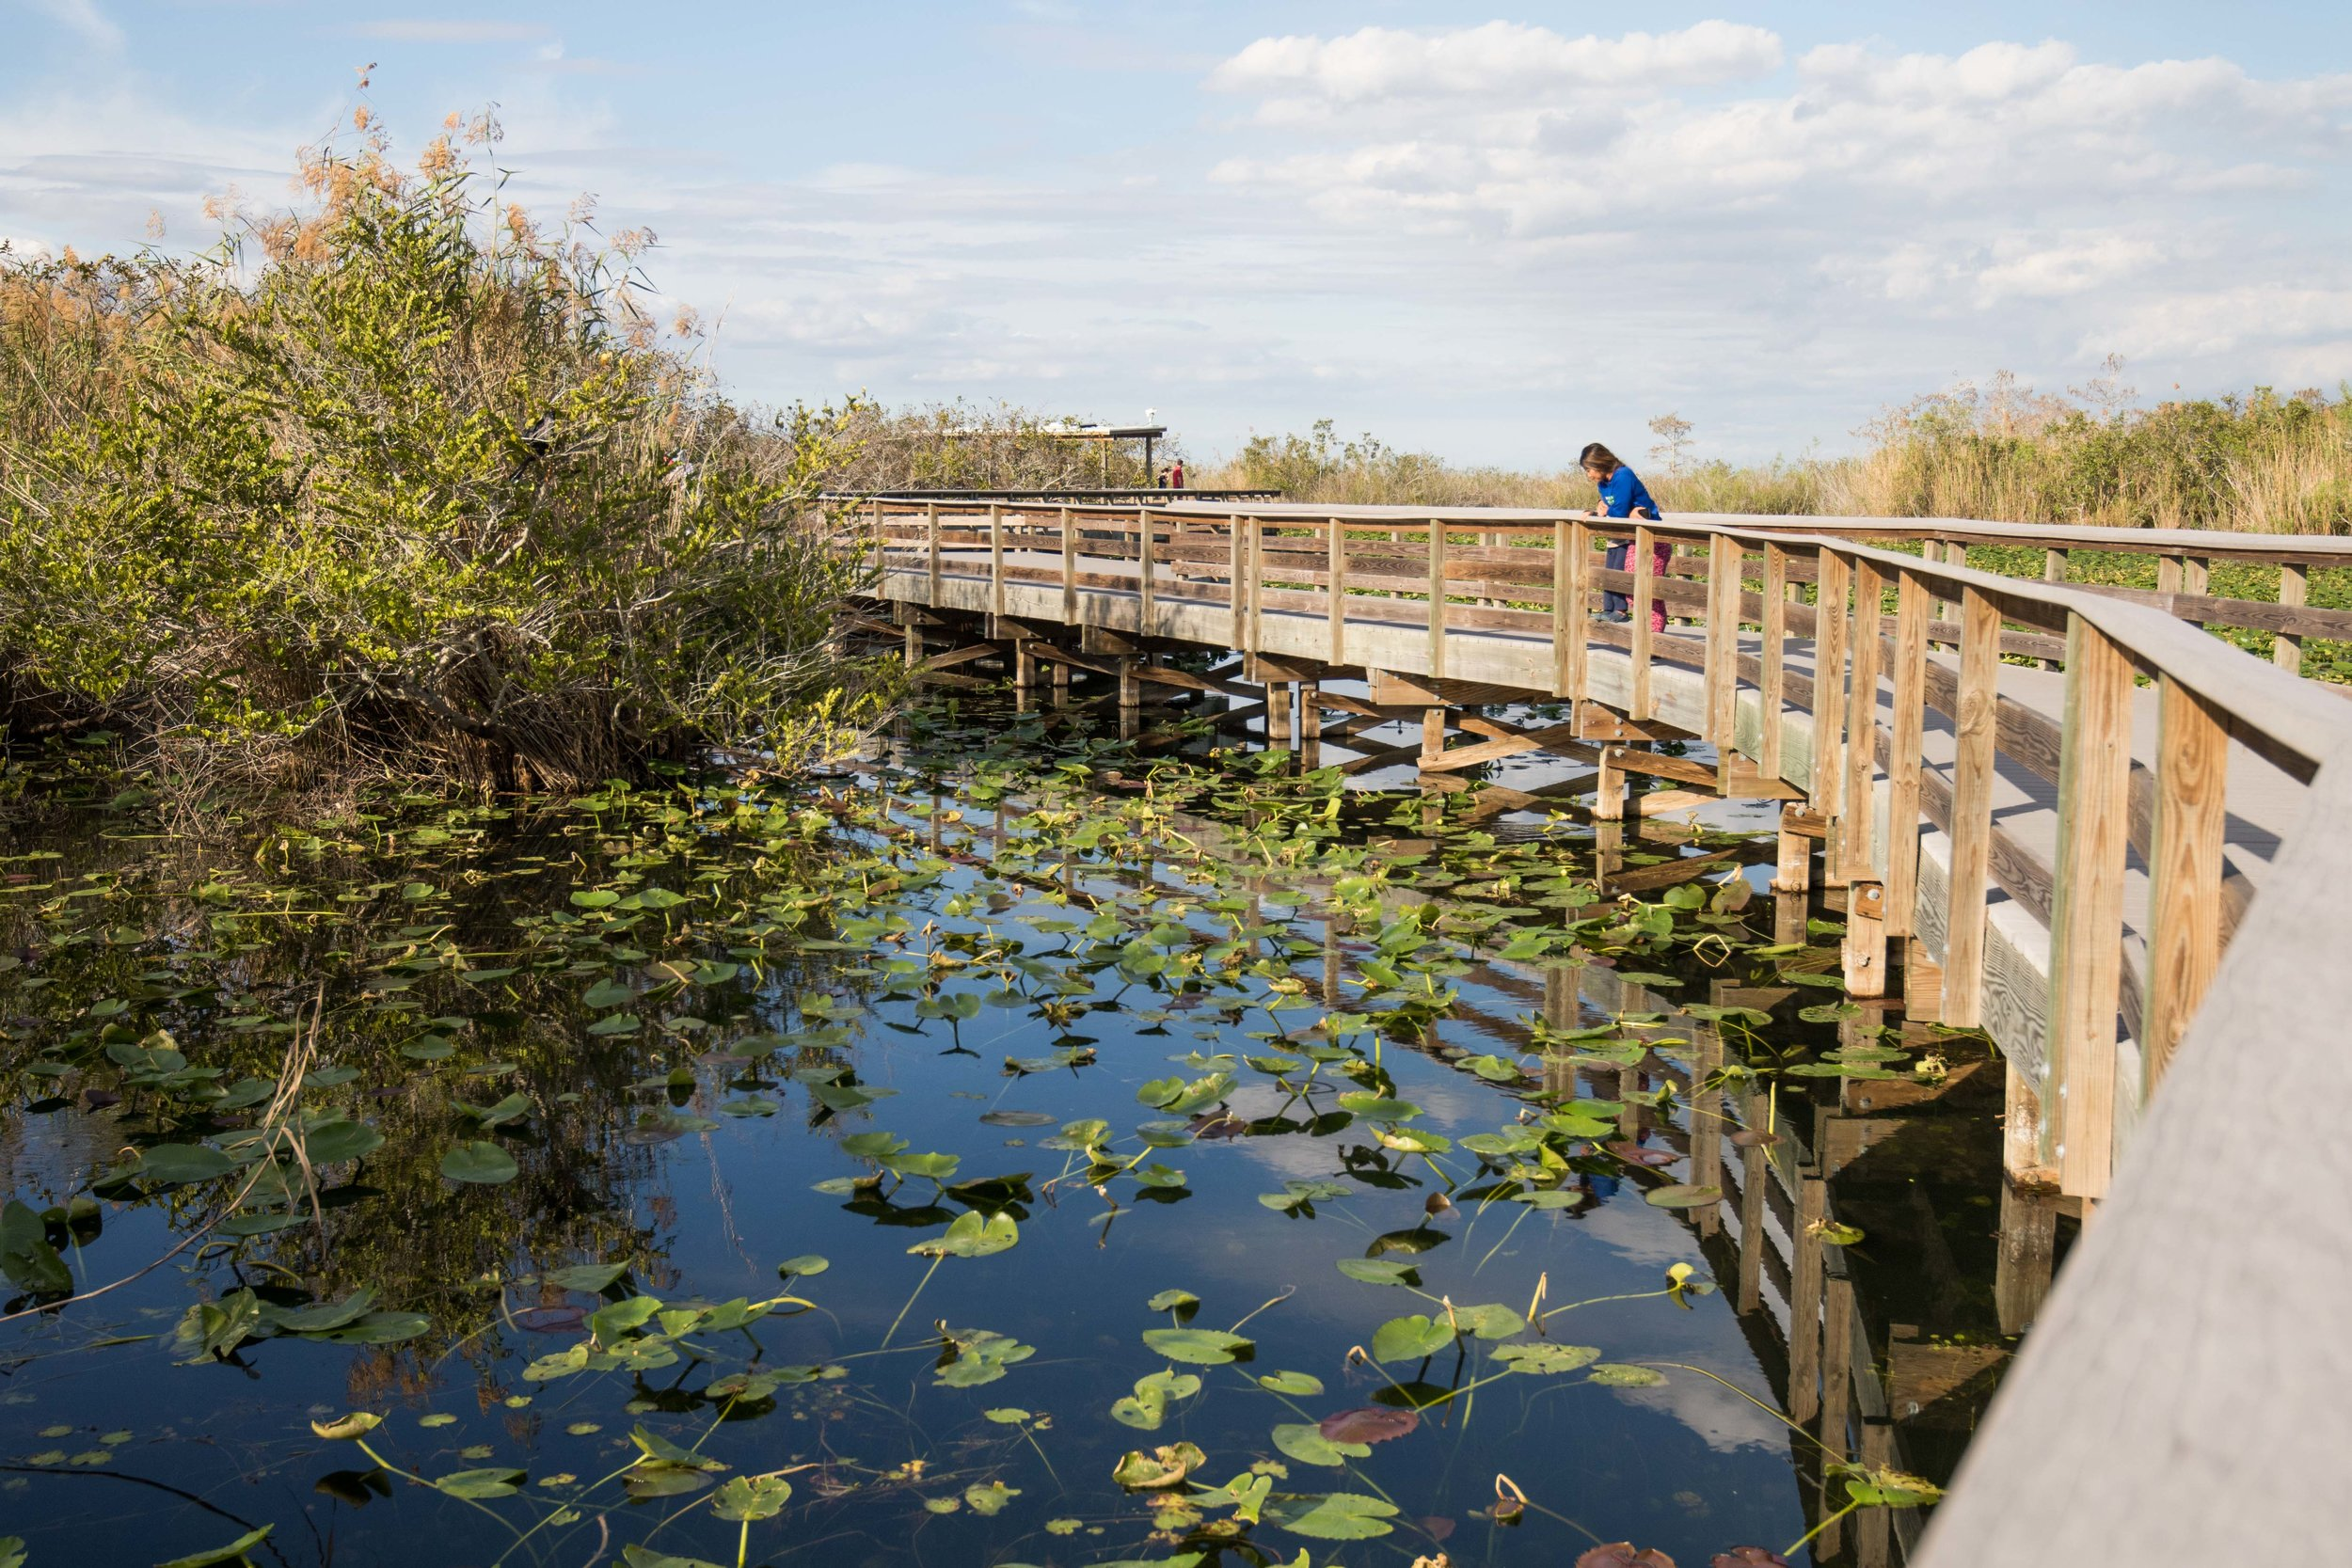 2019_Everglades-309.jpg